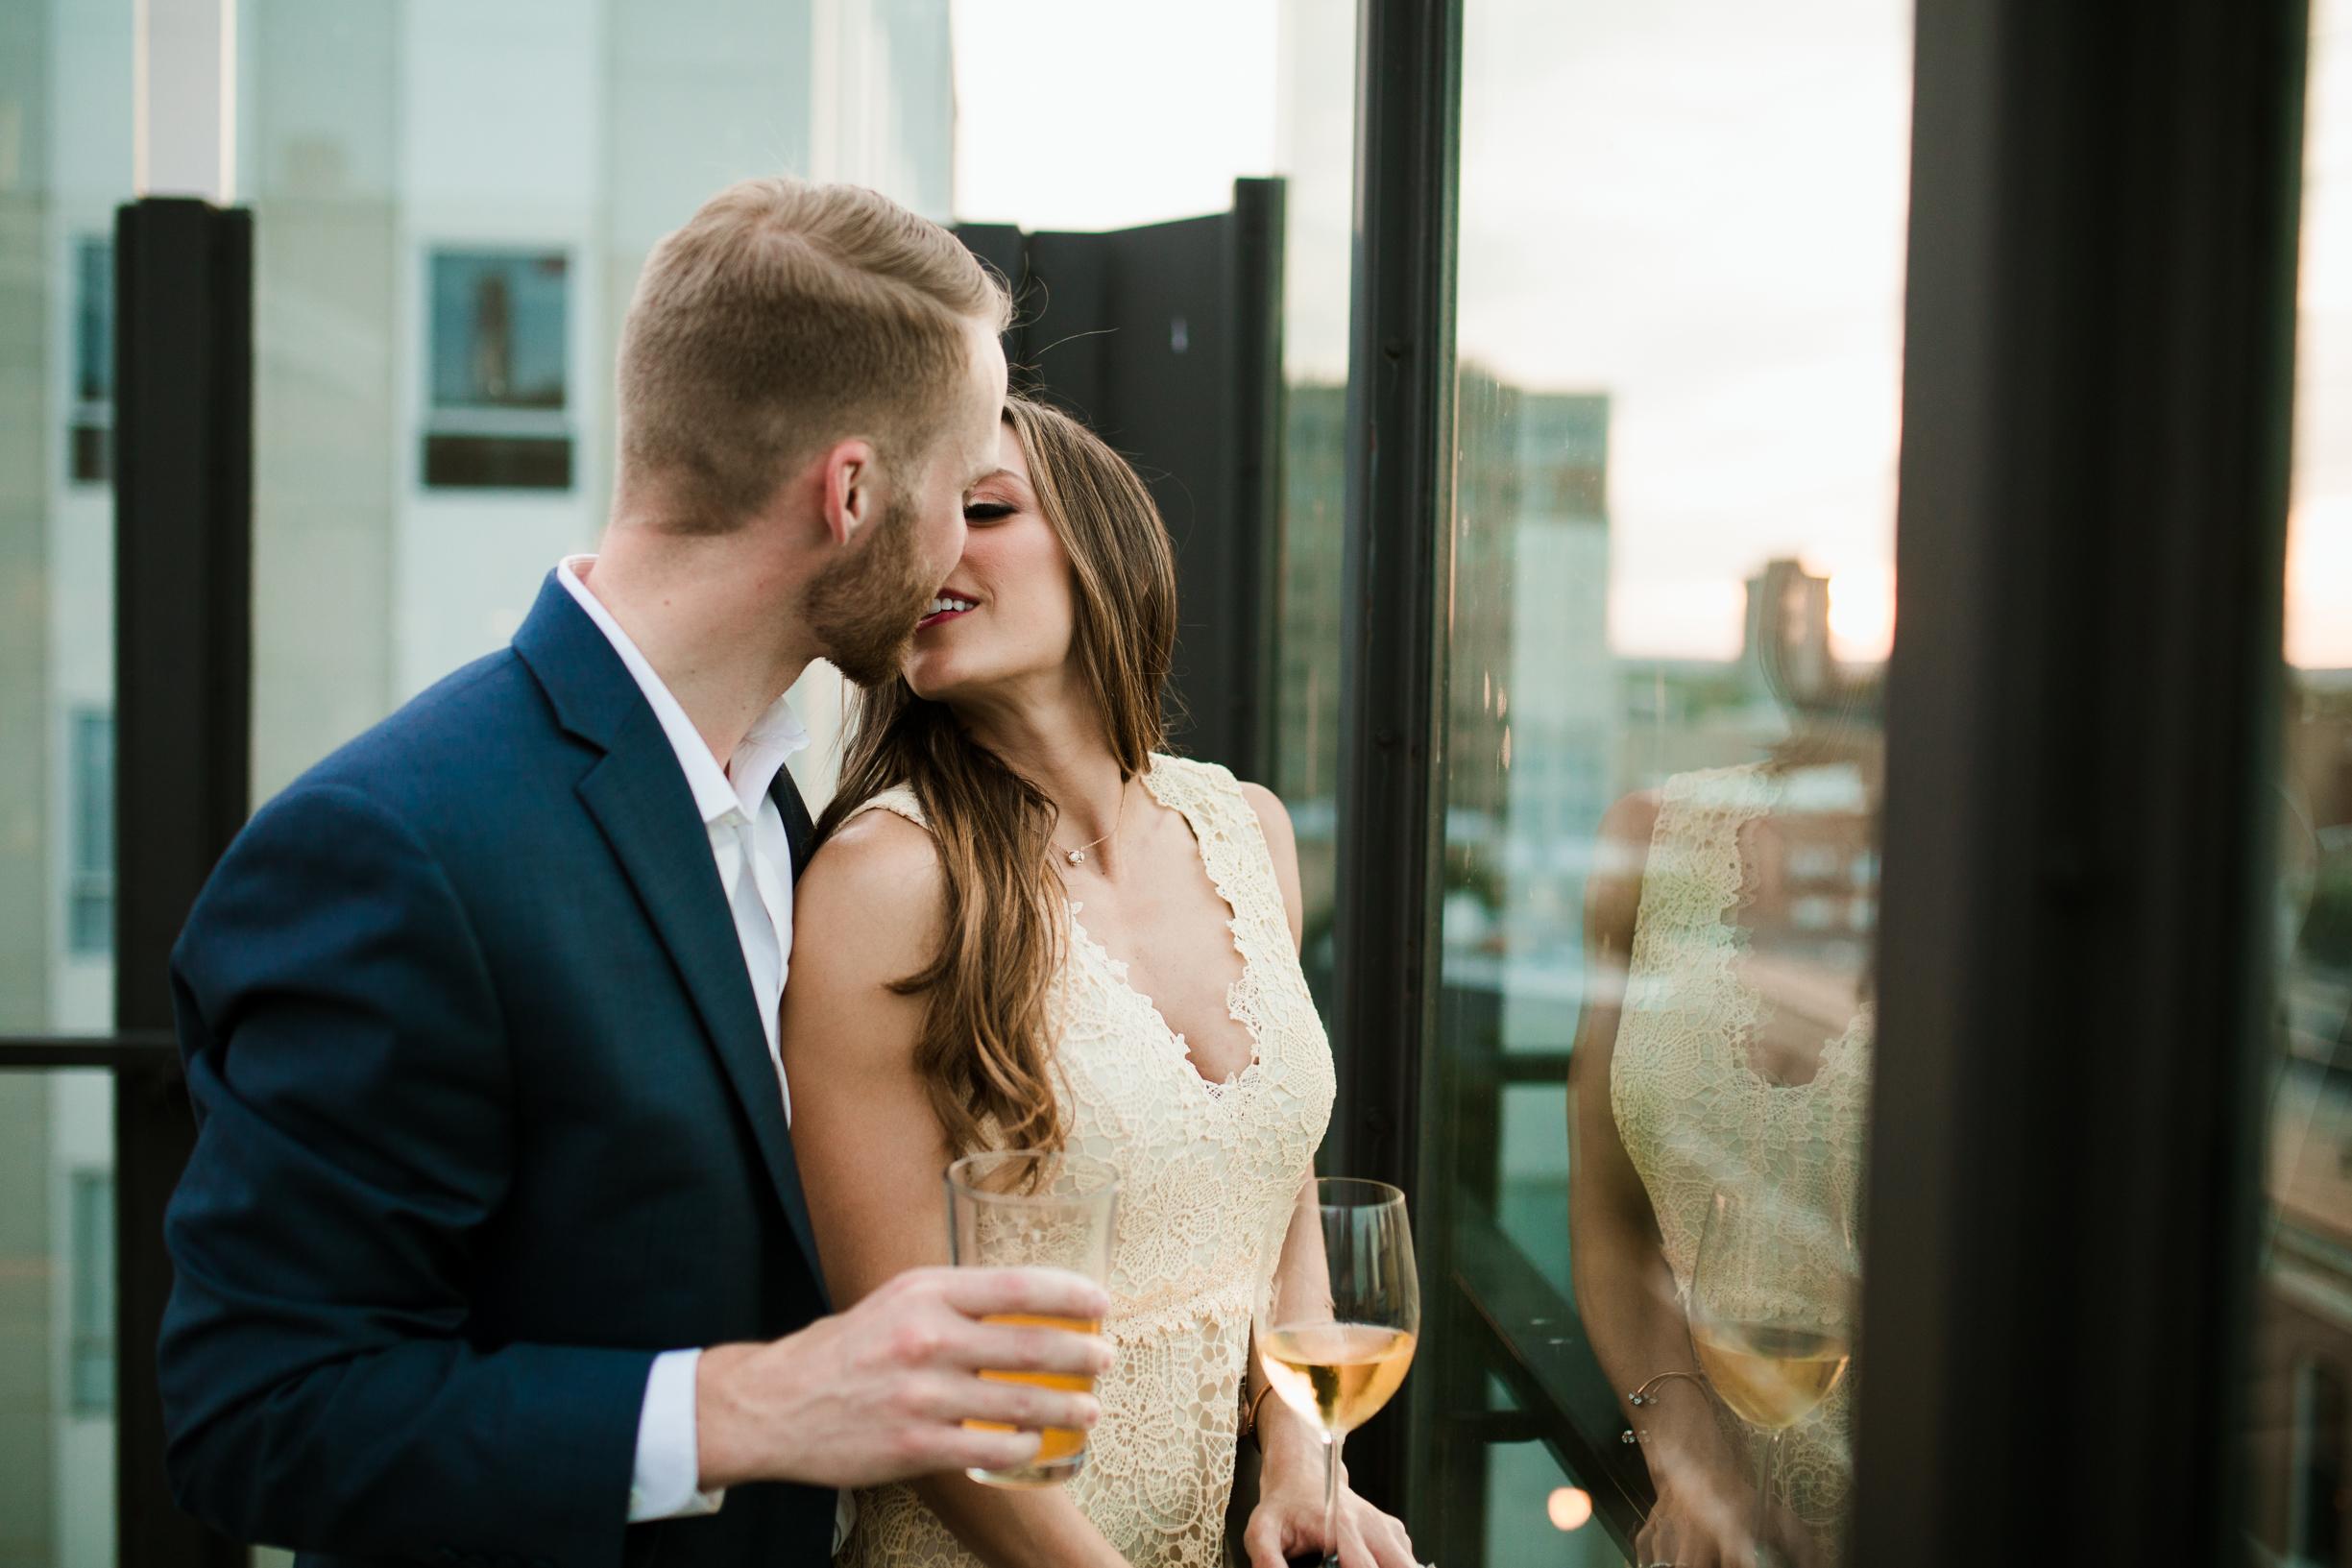 Victoria & Chad Engagement 2018 Crystal Ludwick Photo Louisville Kentucky Wedding Photographer WEBSITE (15 of 48).jpg